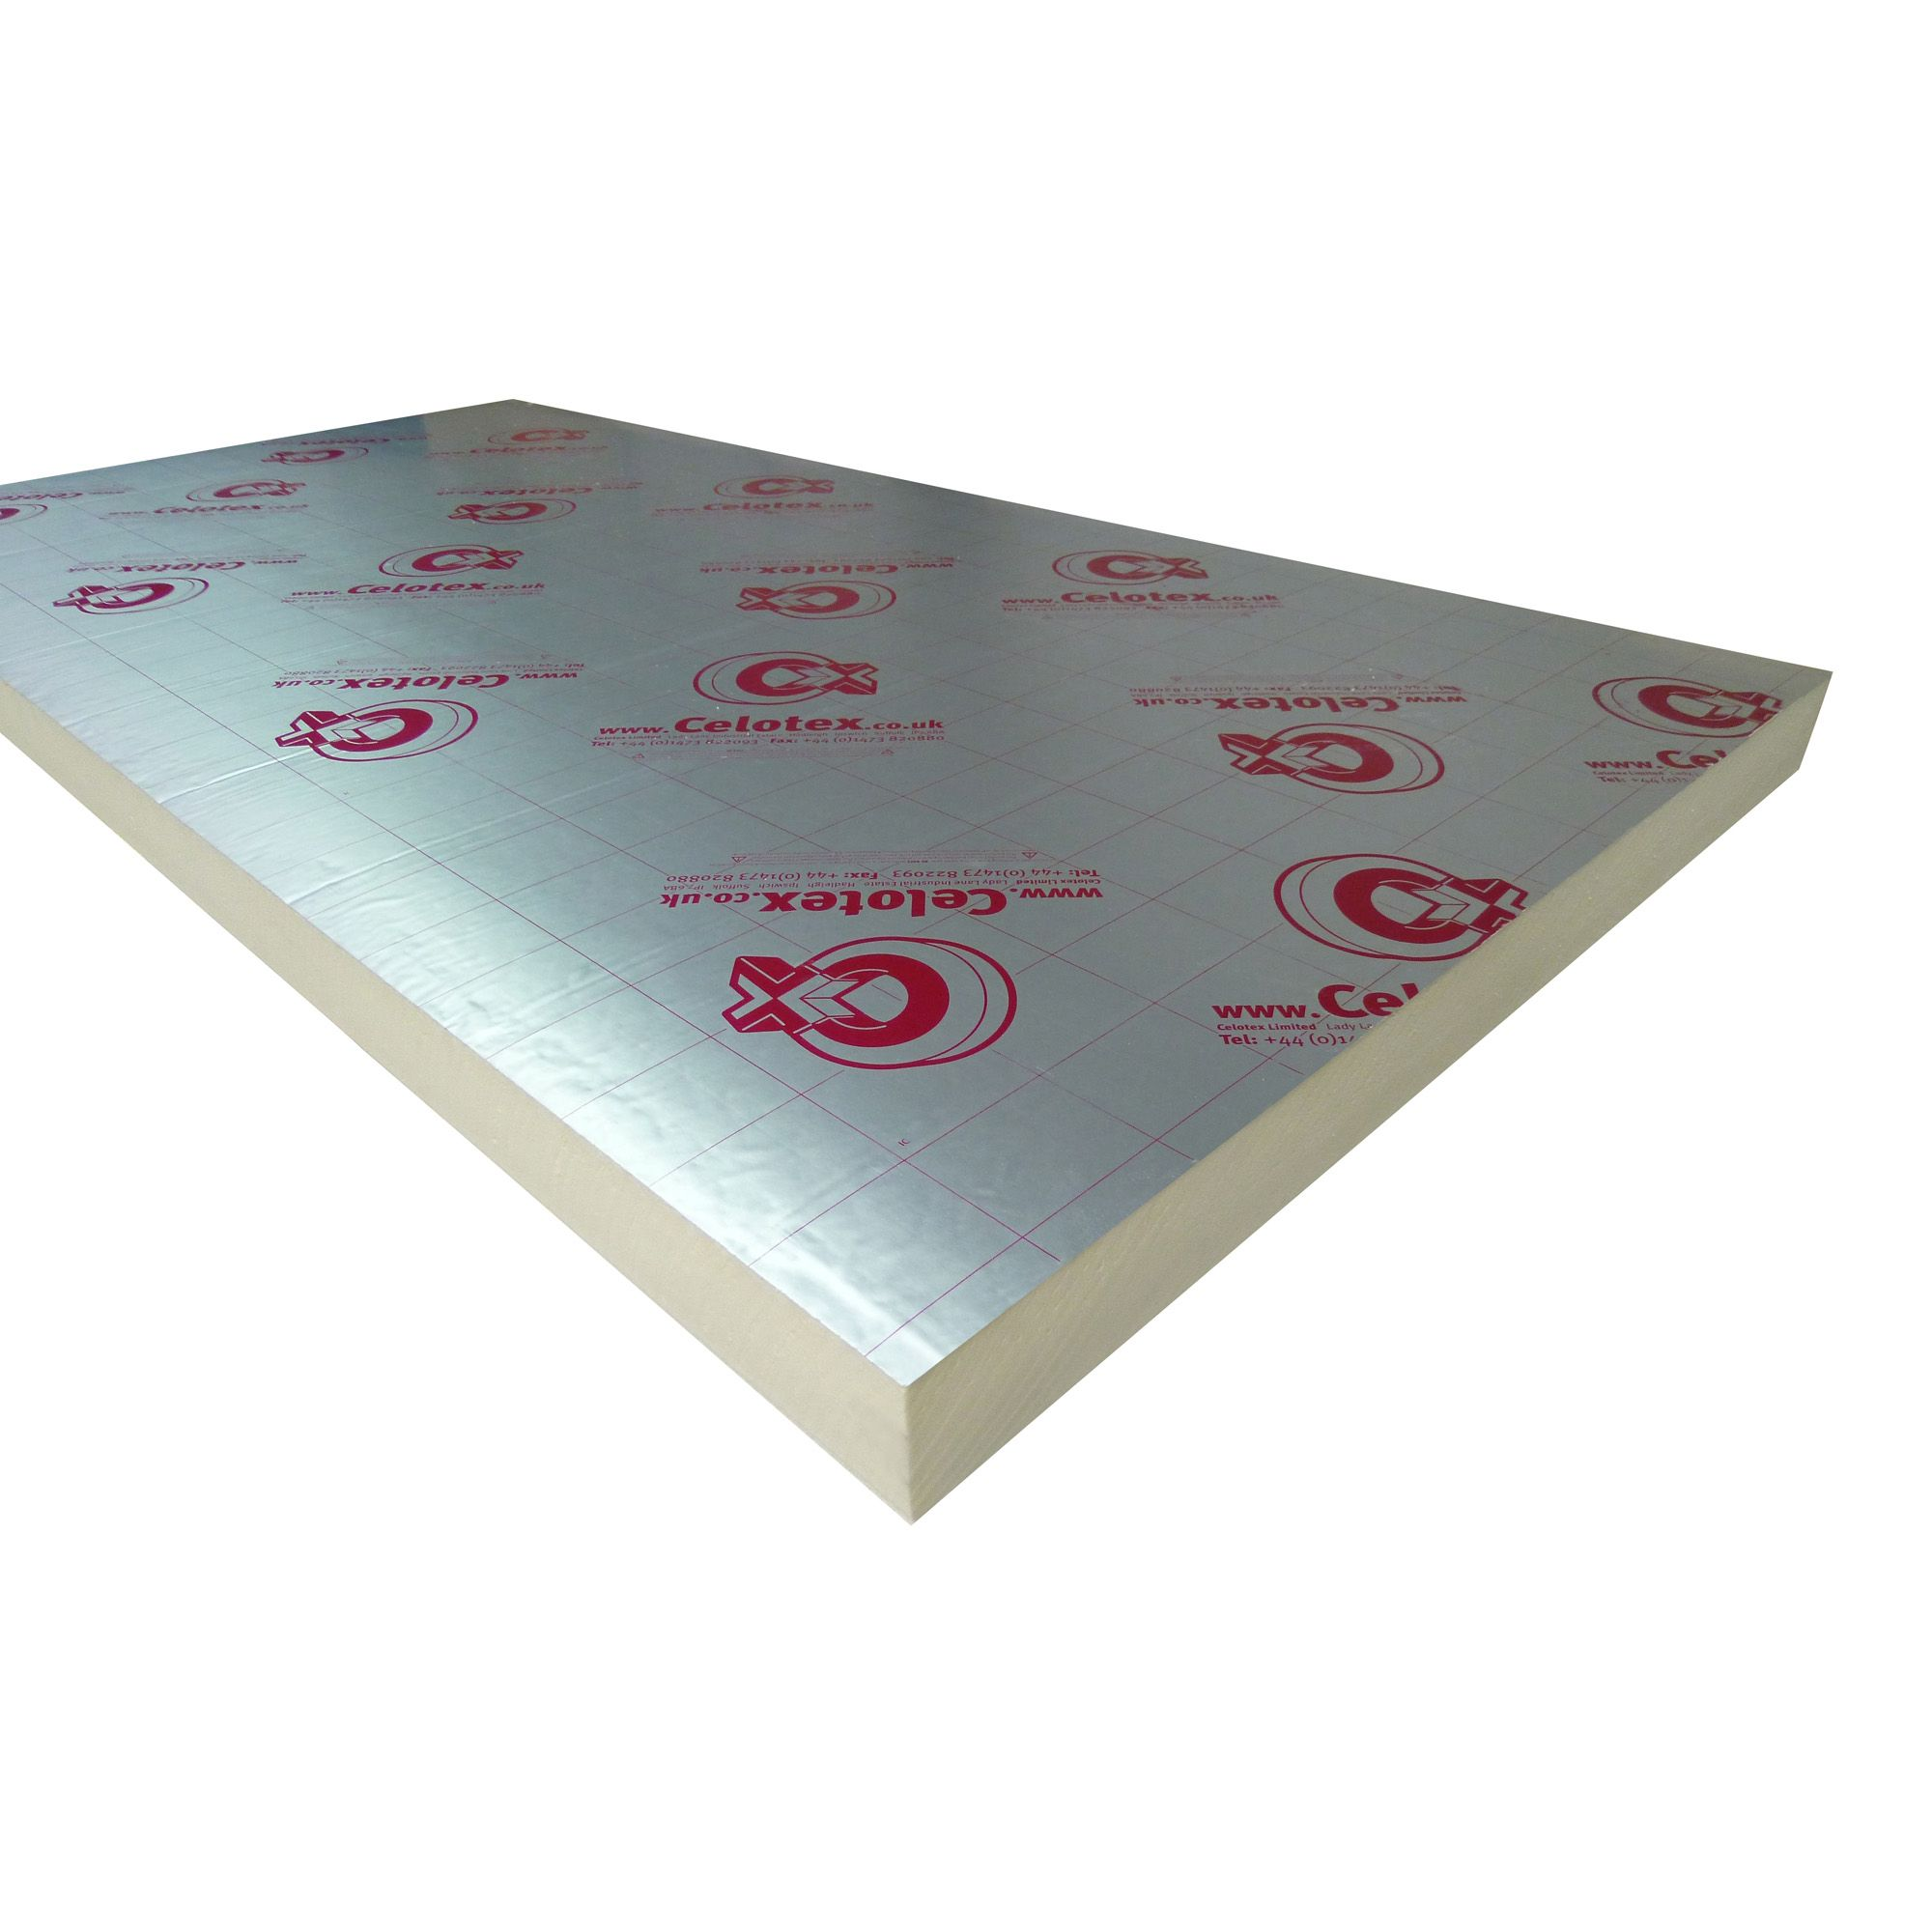 Celotex Tb4000 Insulation Board 2400mm 1200mm 25mm